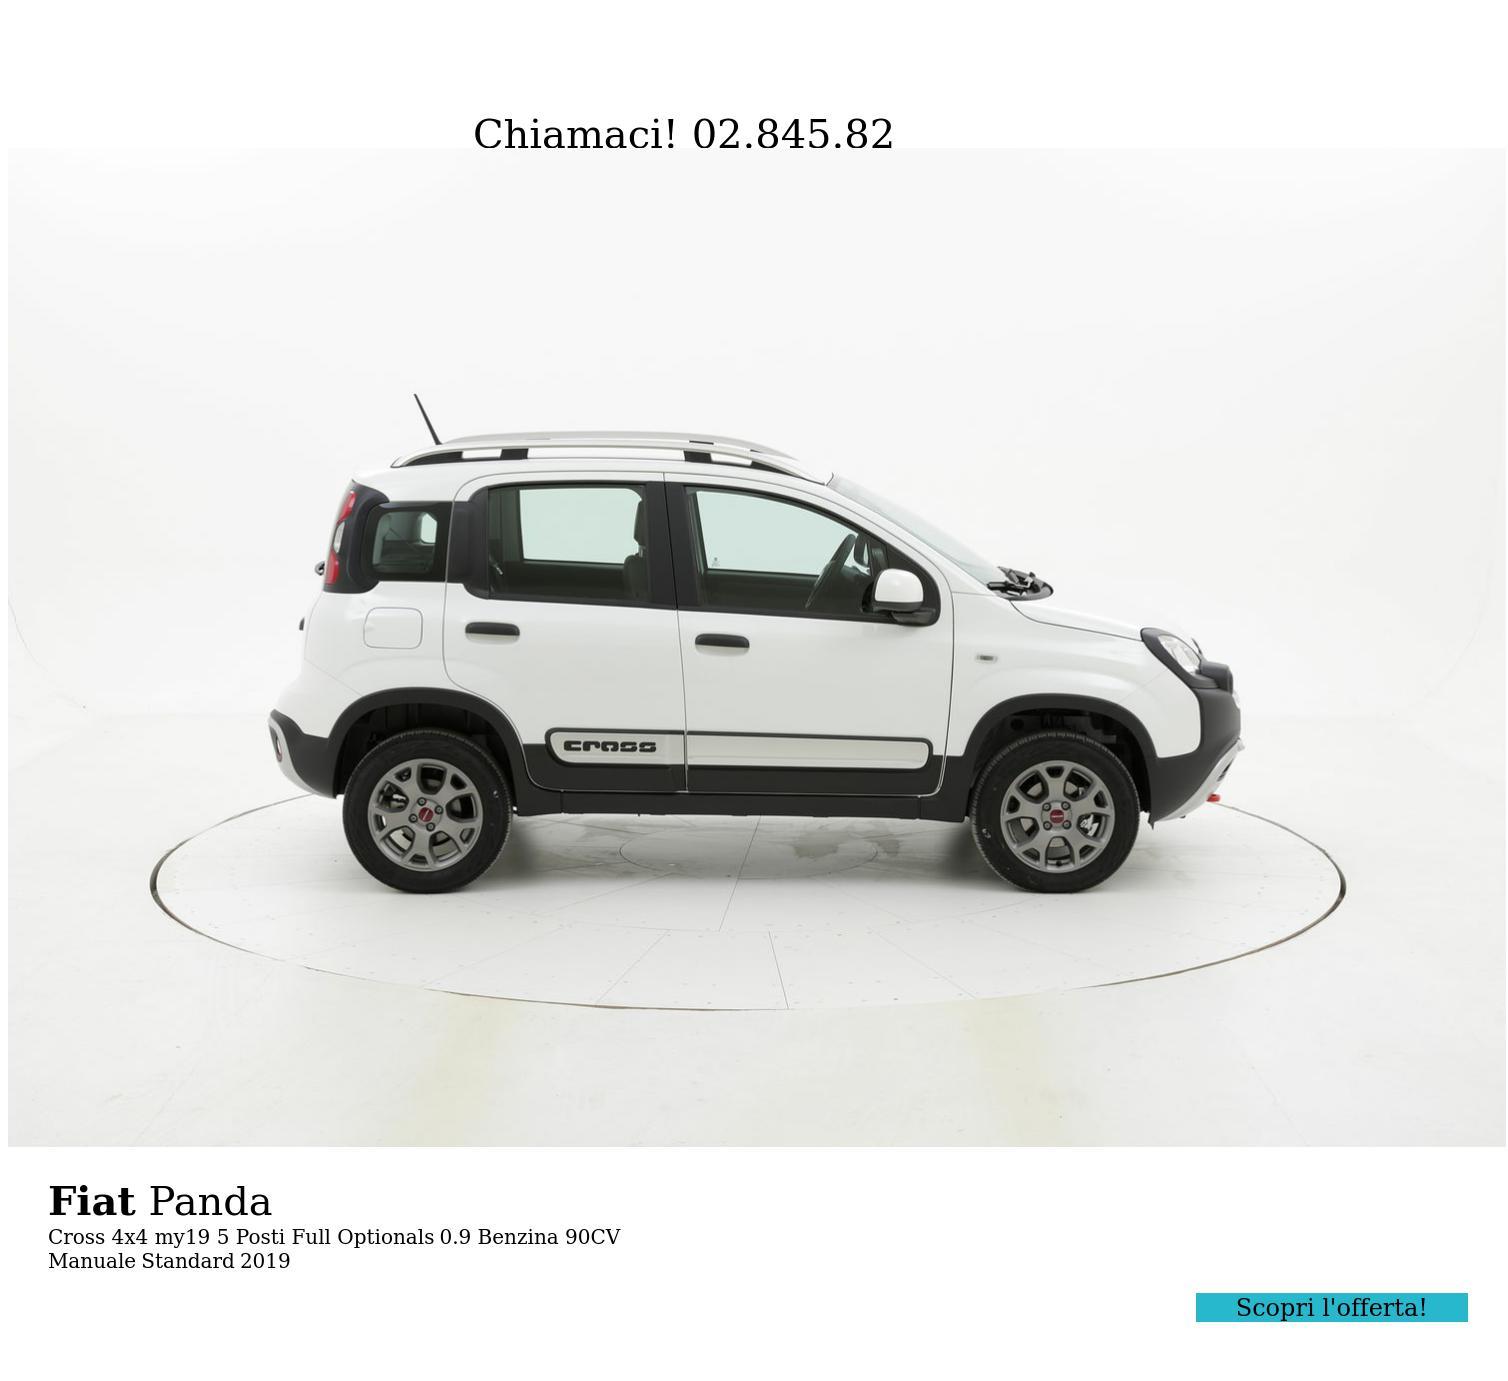 Fiat Panda Cross 4x4 my19 5 Posti Full Optionals km 0 benzina bianca   brumbrum